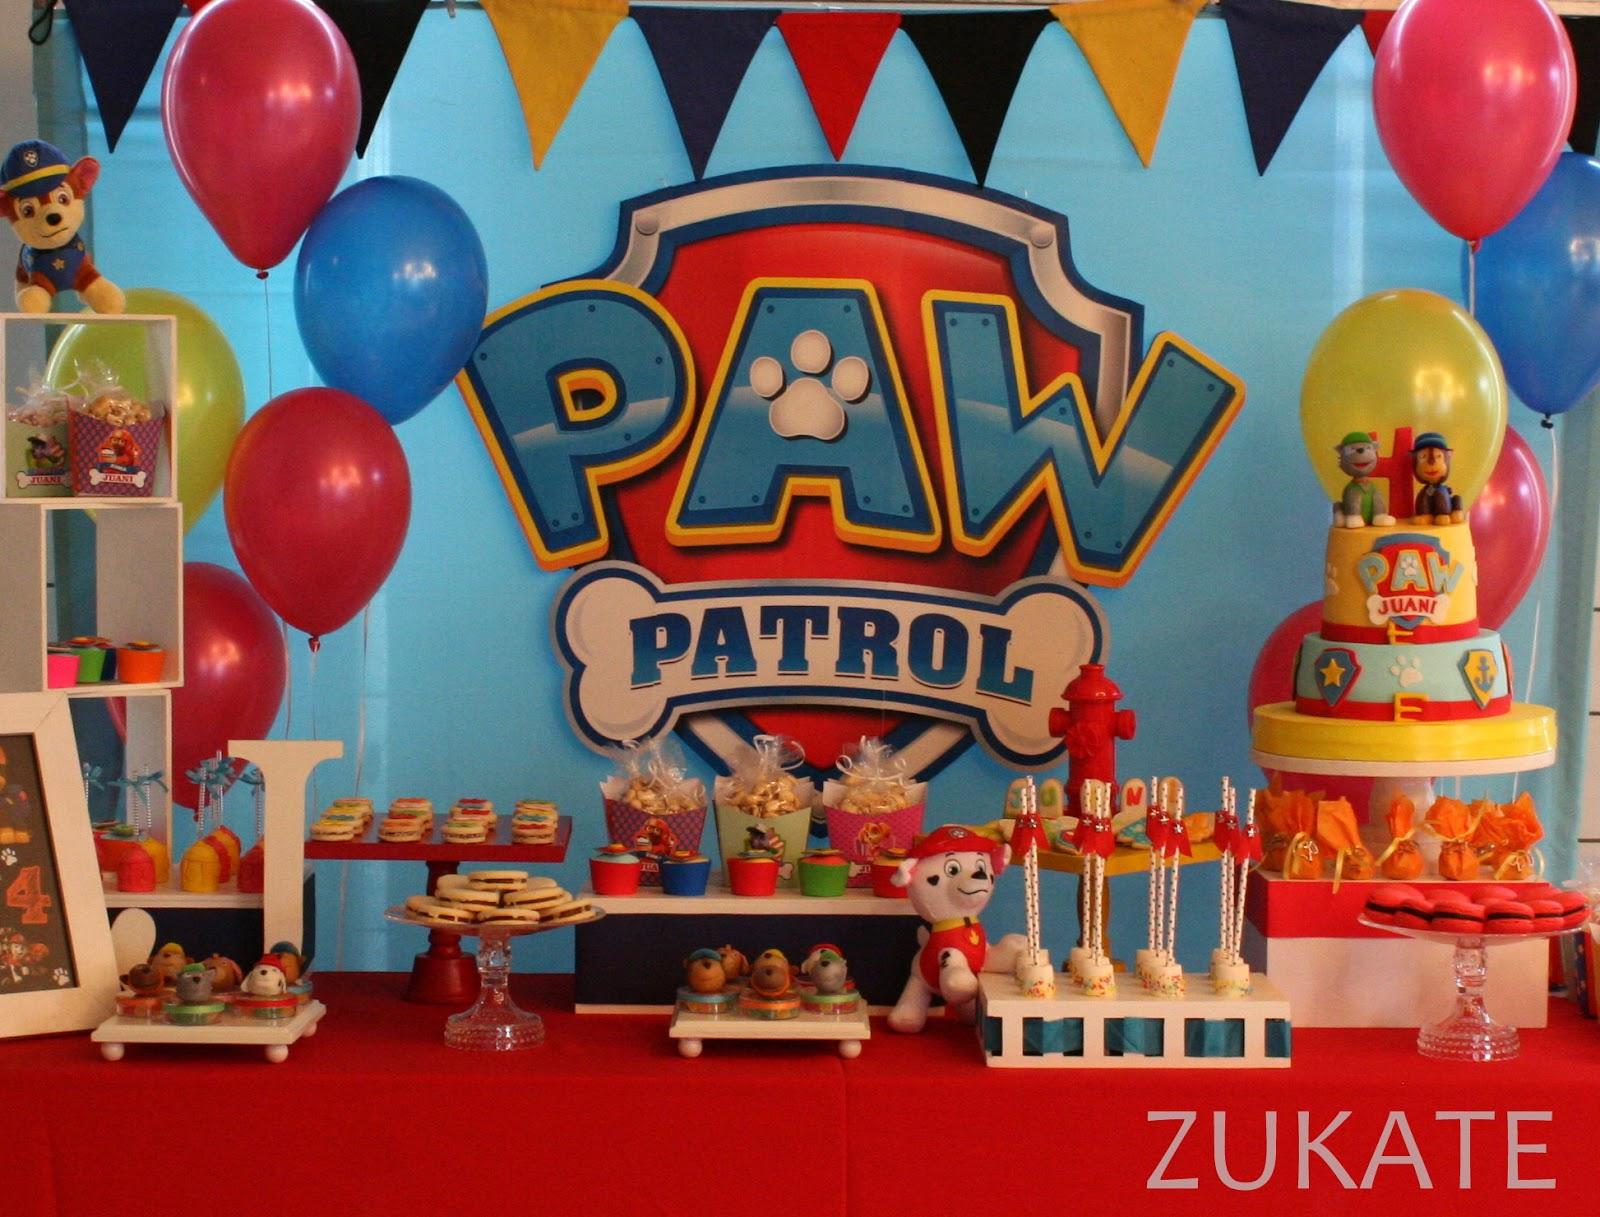 Fiesta de patrulla canina para juani zukate - Decoracion de la patrulla canina ...